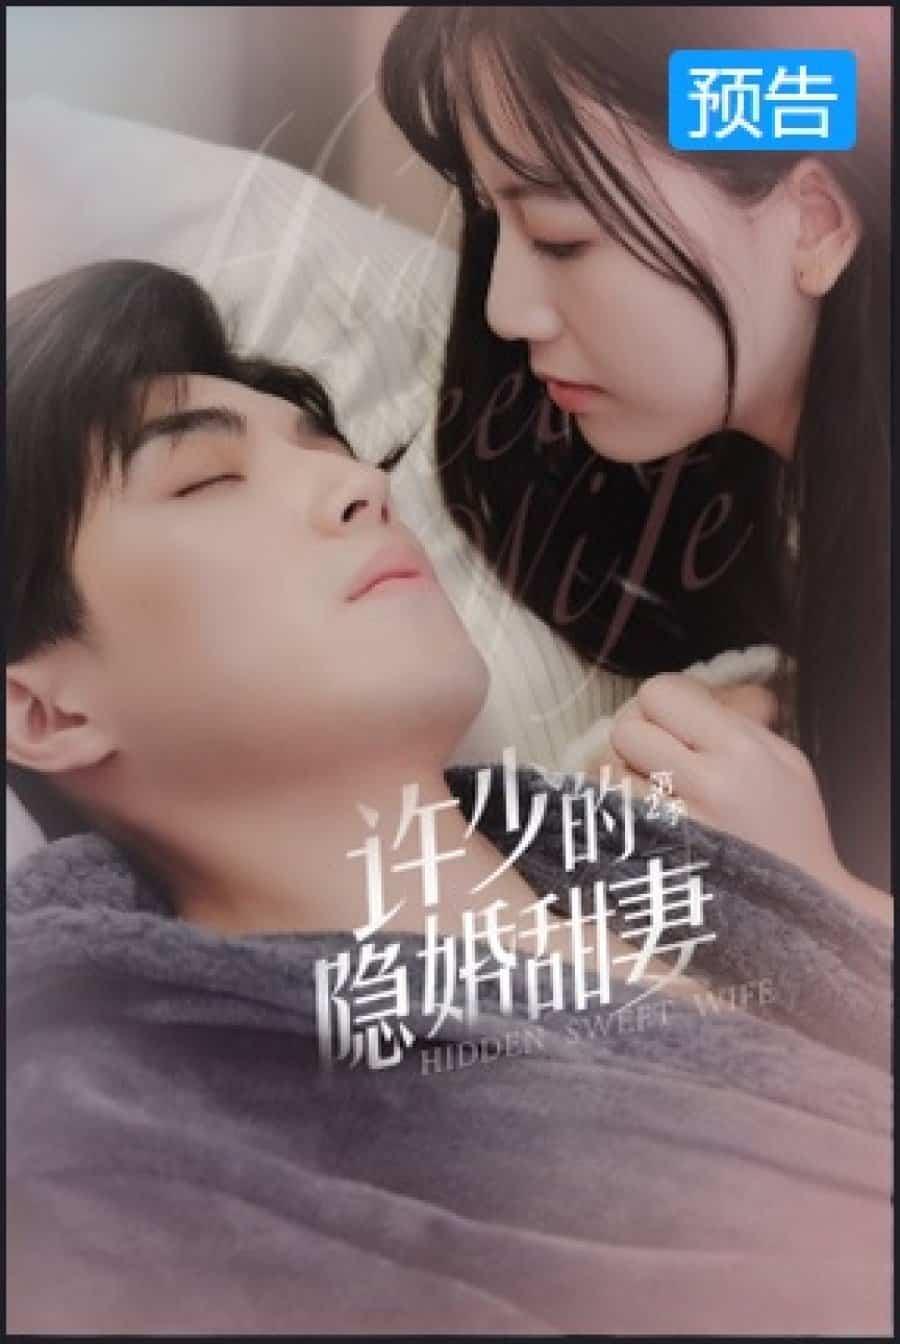 Hidden Sweet Wife Season 2 (2021) ภรรยาแสนหวานที่ซ่อนอยู่ของสวี่เช่ว ภาค 2 ซับไทย EP1-EP30